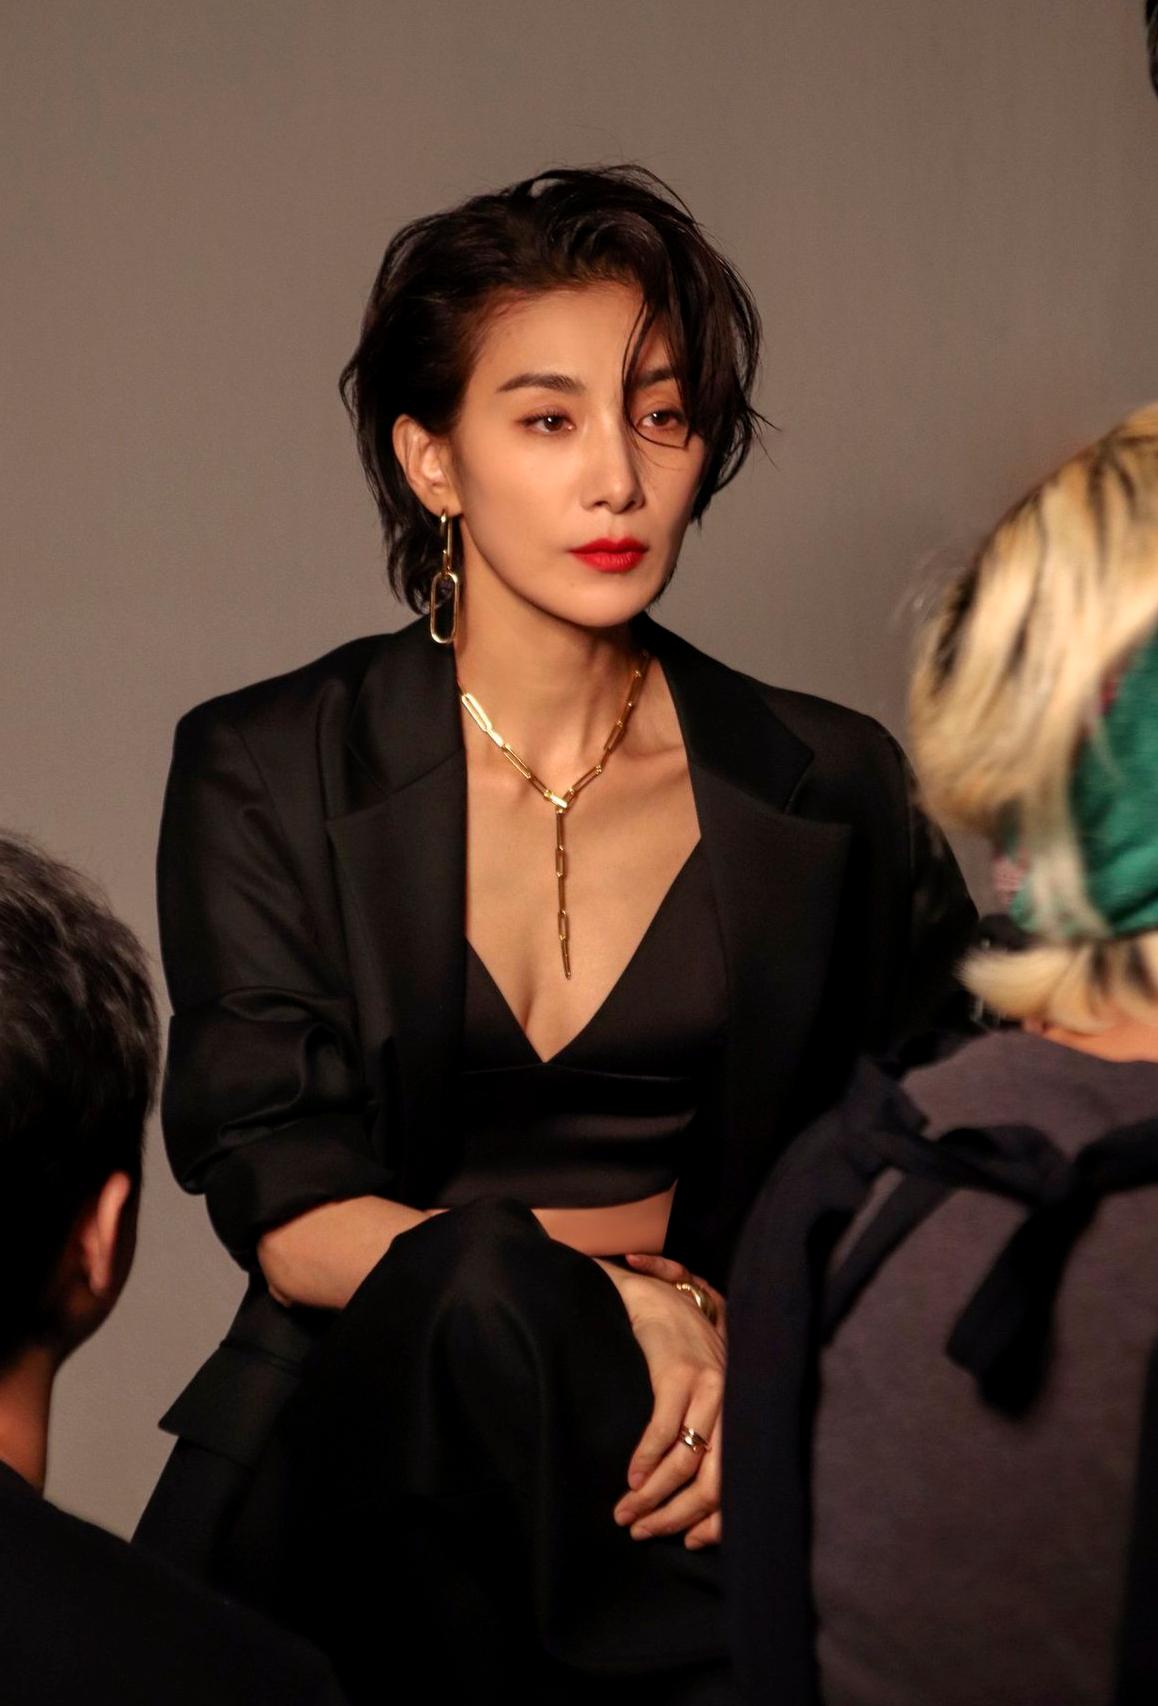 dien vien kim seo hyung elle 5 fly up